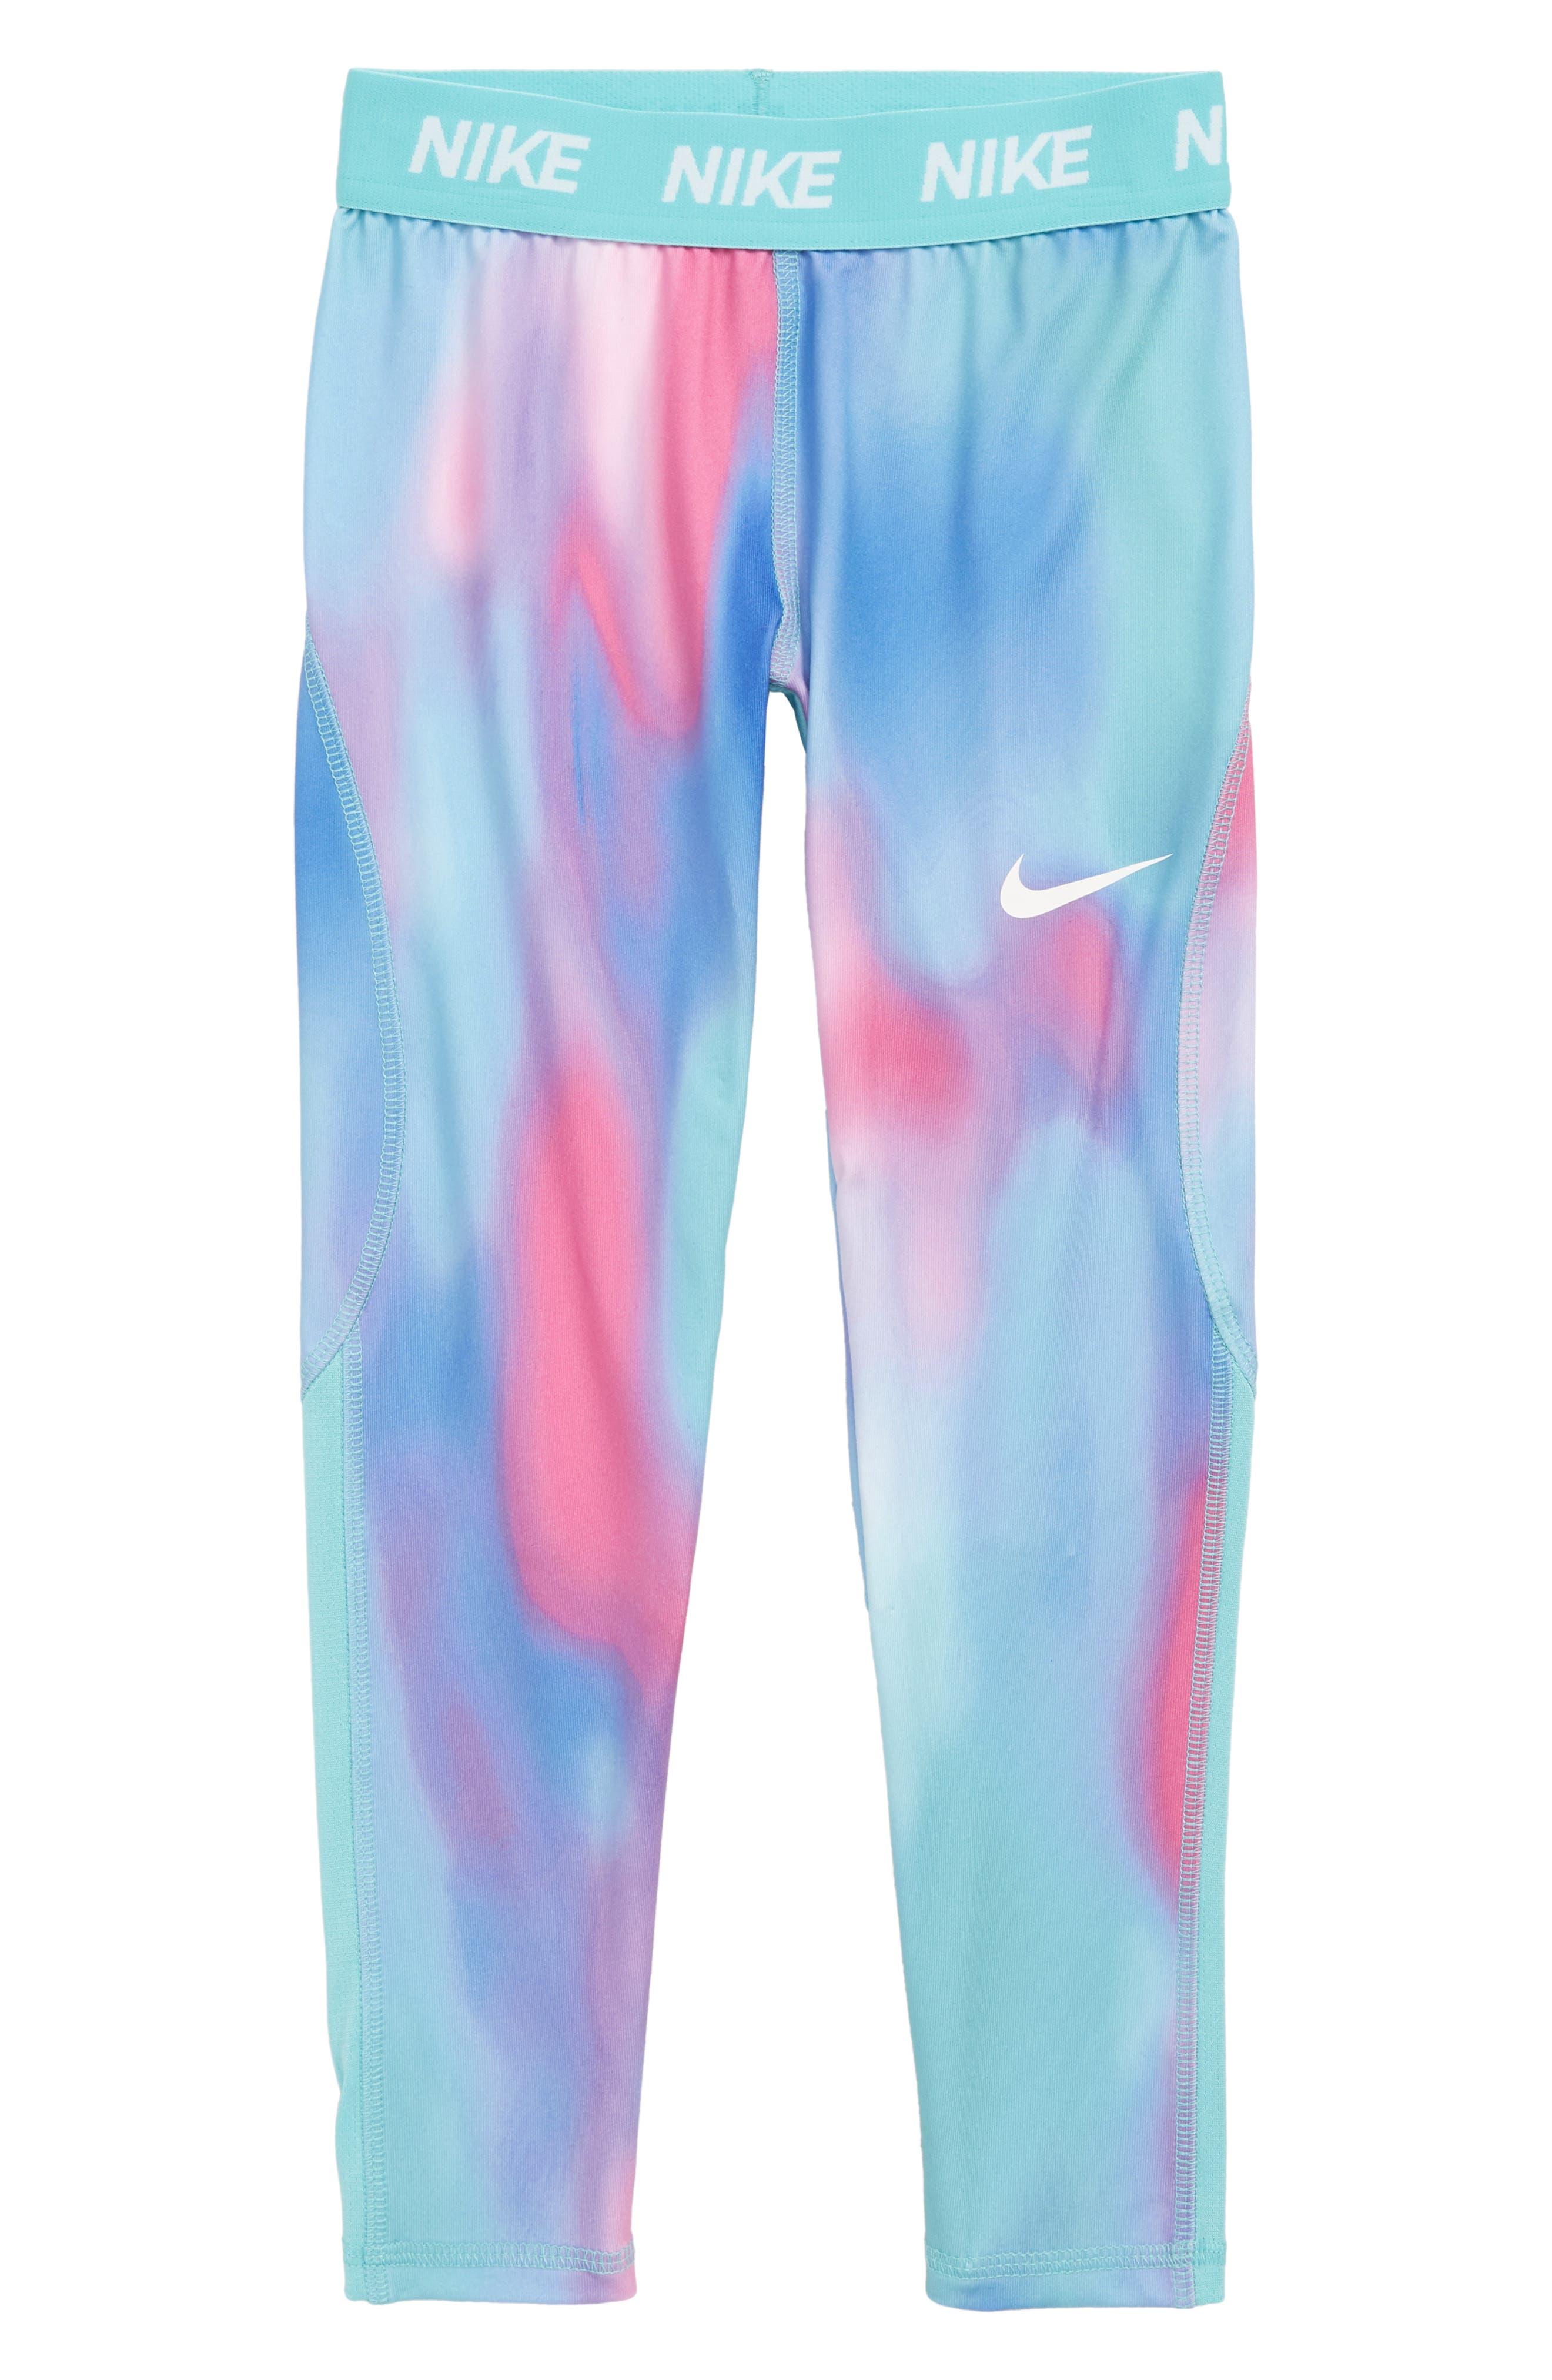 Toddler Girls Nike Dry Print Leggings